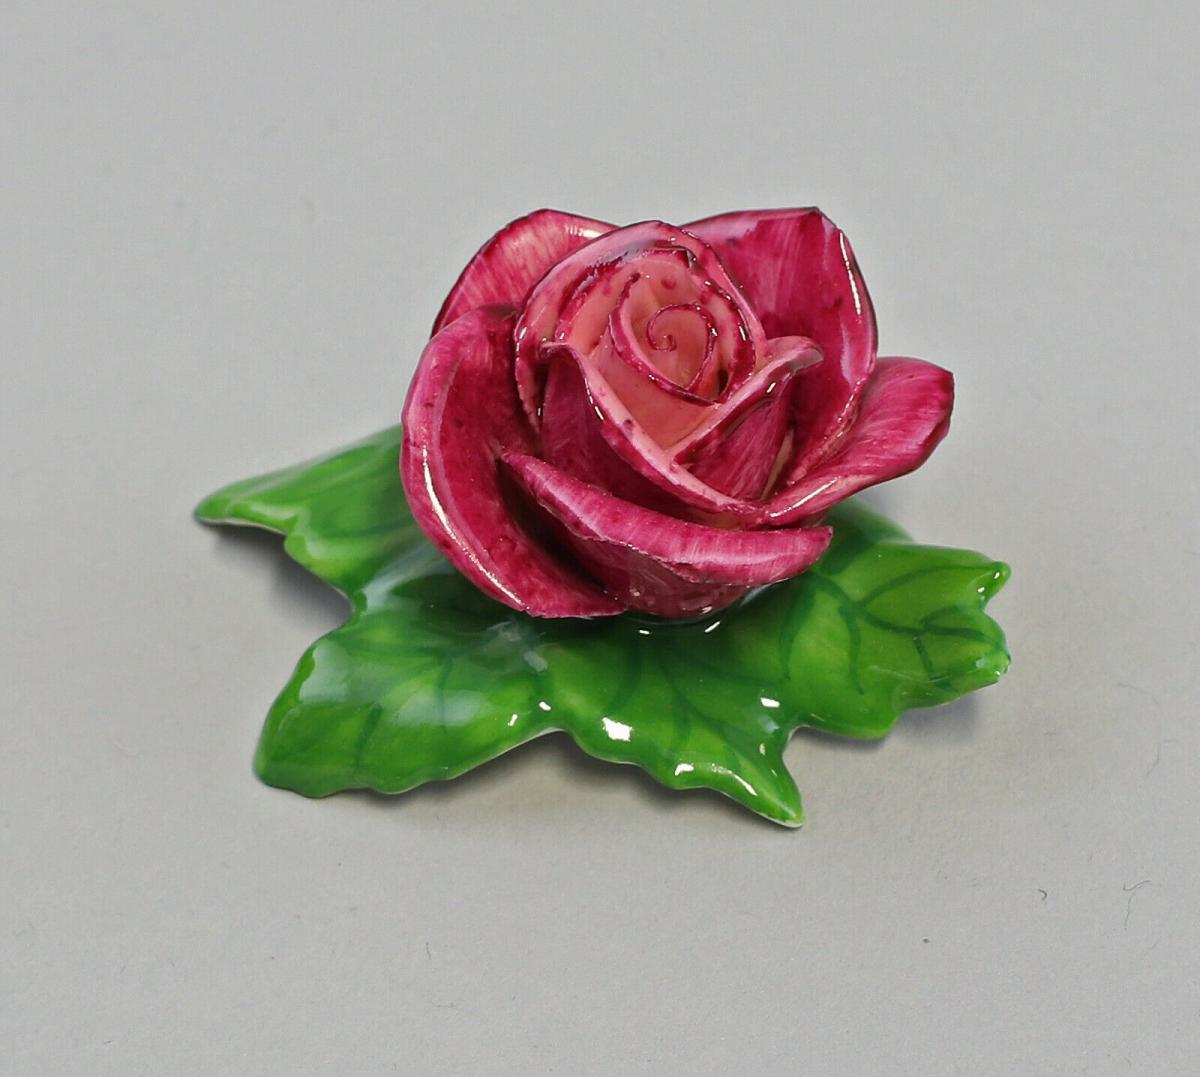 9959618 Porzellan Figur Tischblume Rose purpur Ens 7x5x3cm